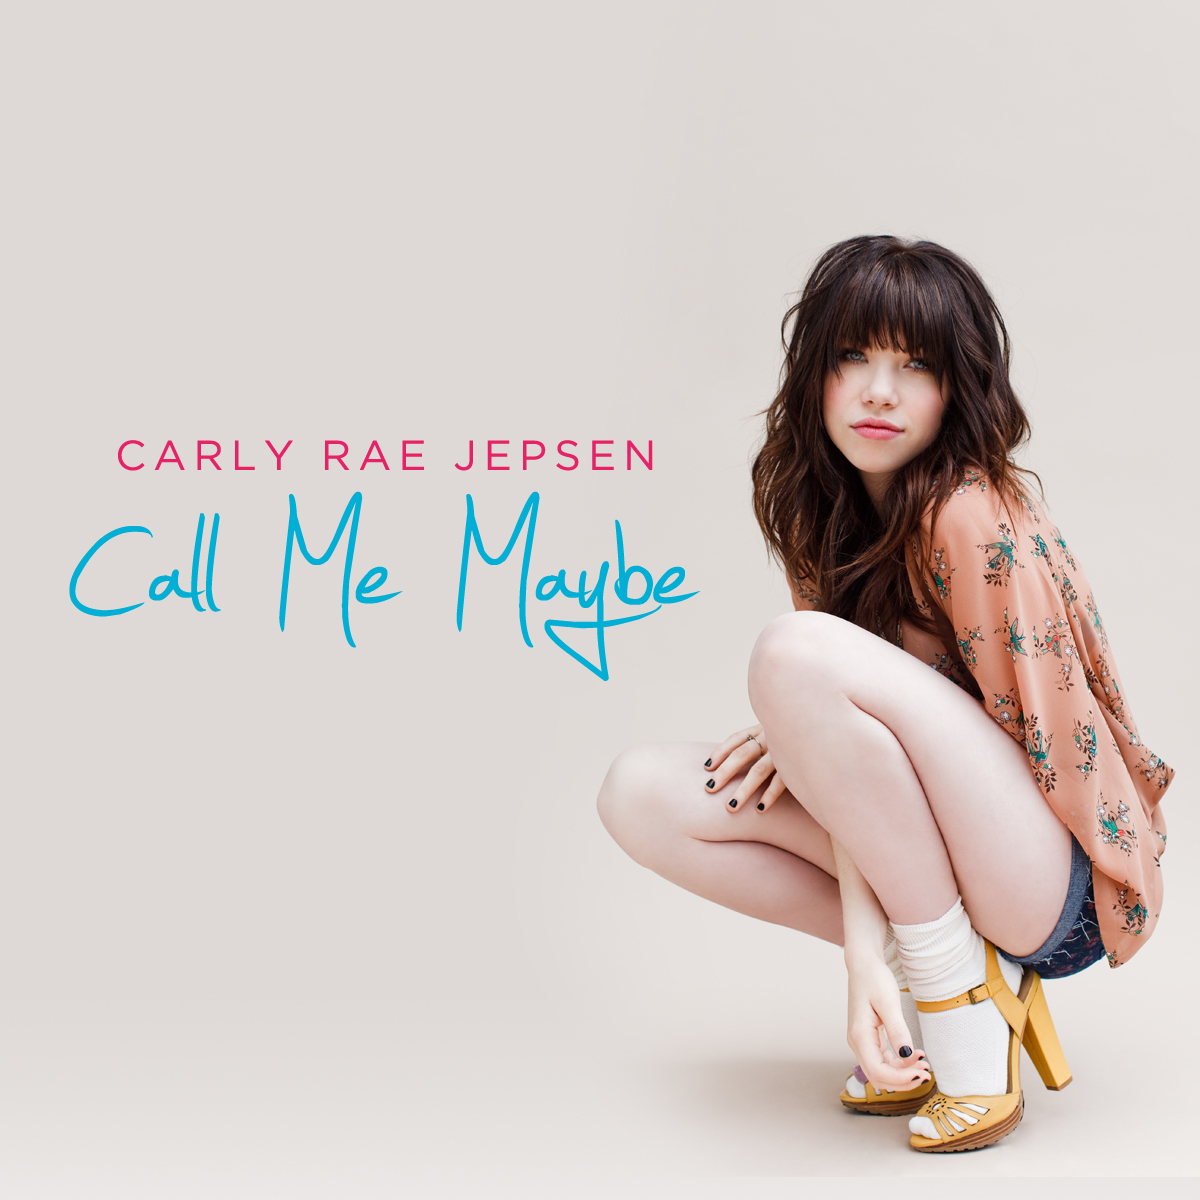 Call me maybe lyrics mp3 download.